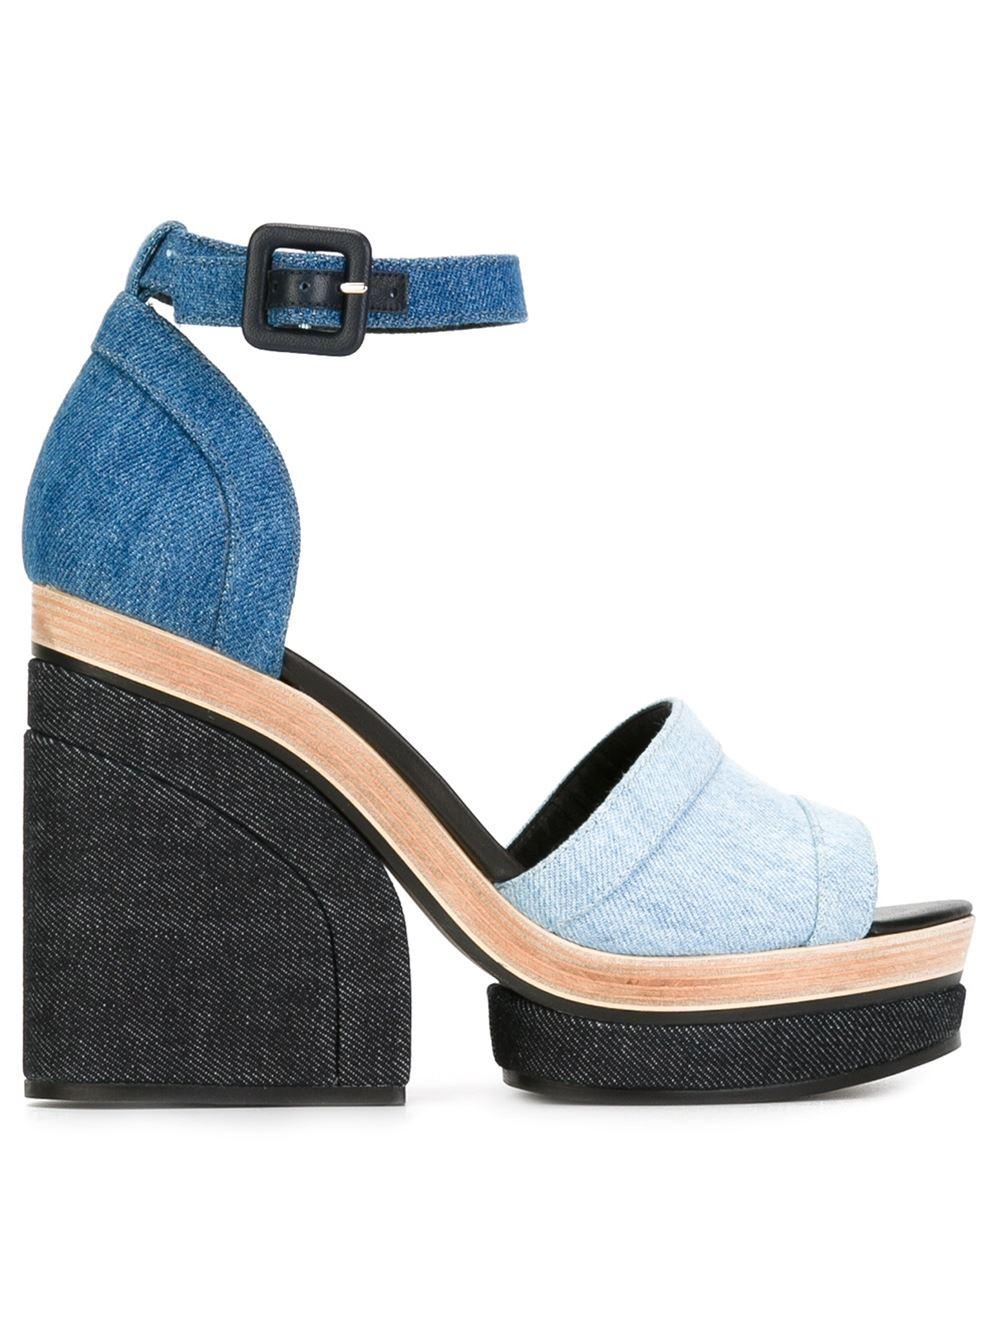 Pierre Hardy Charlotte sandals, FarFetch.com